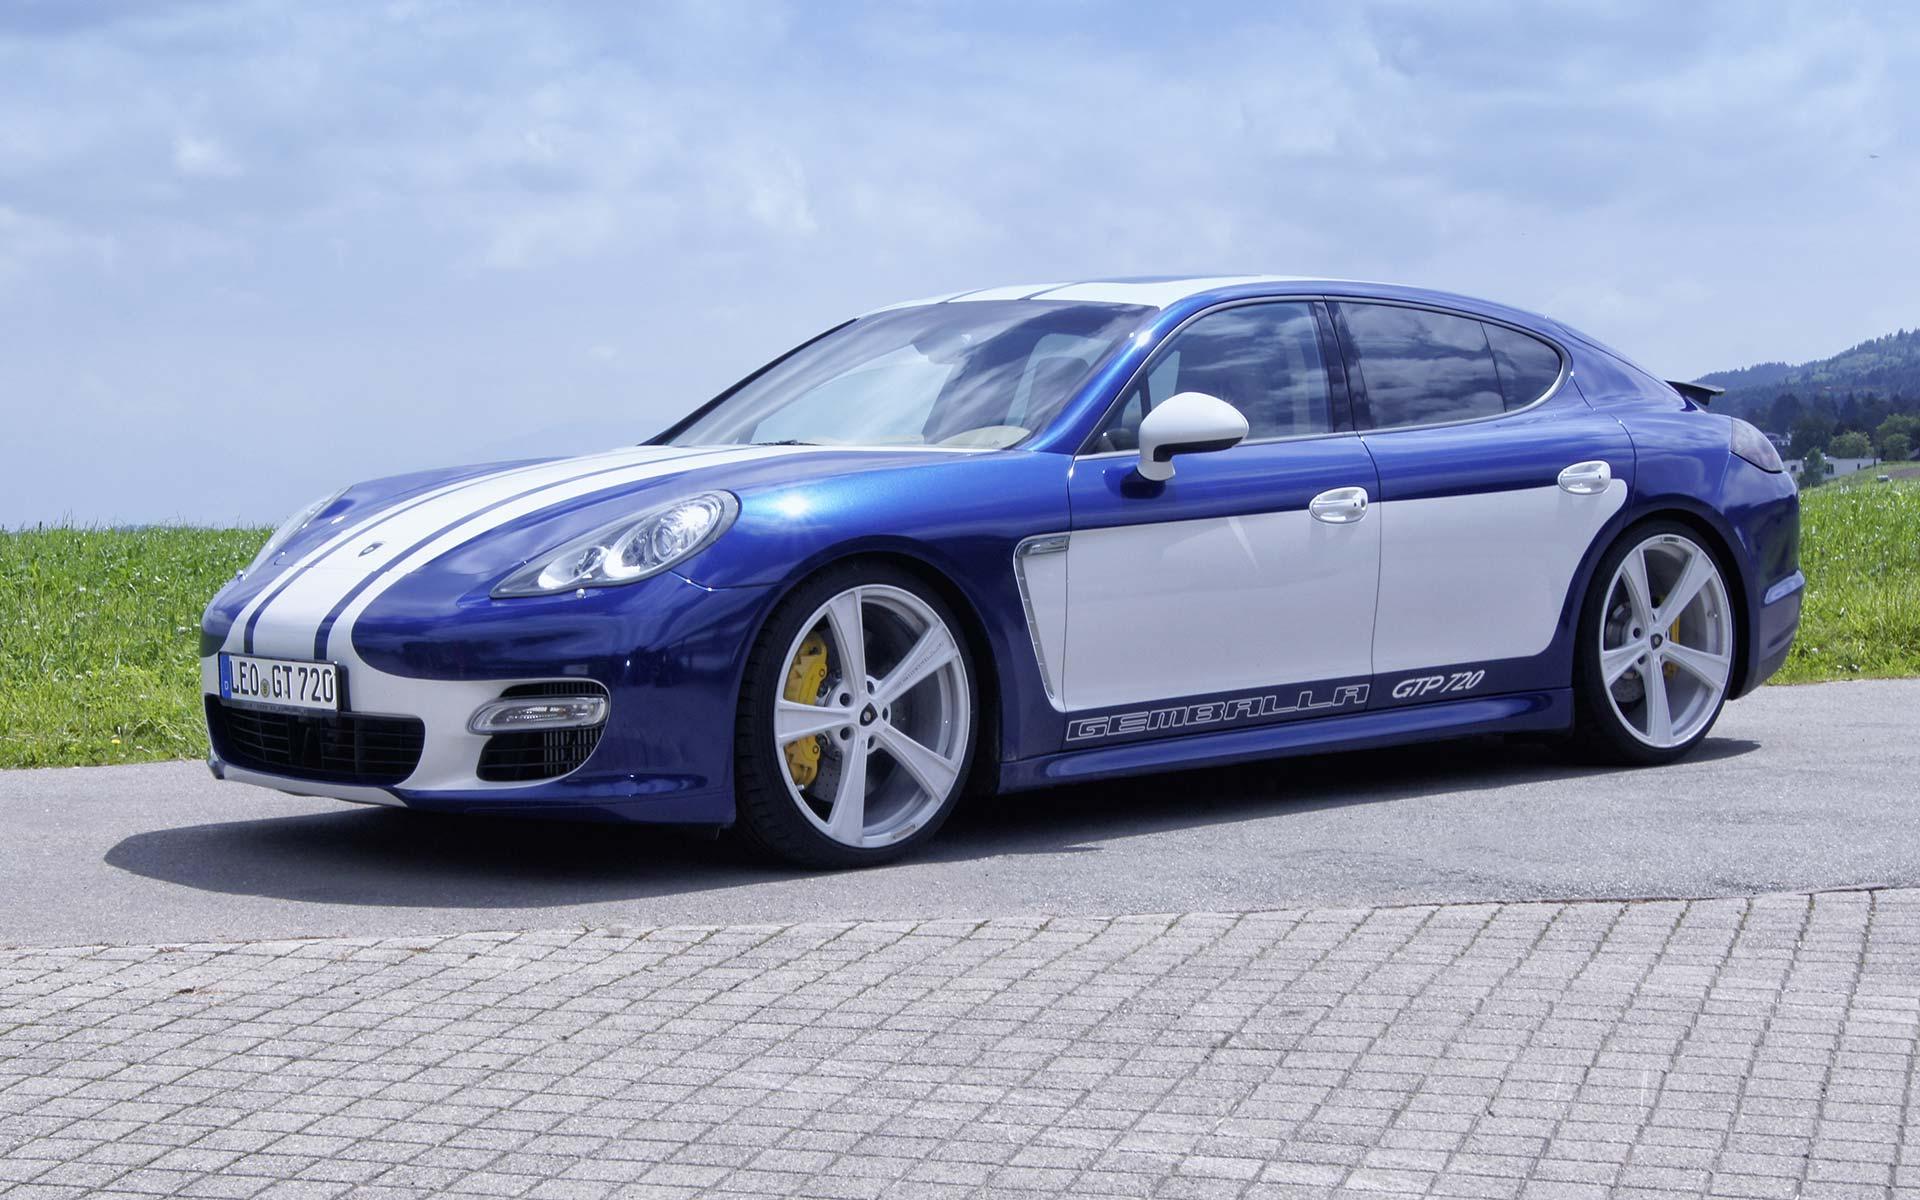 Gemballa GTP 720 тюнинг|tuning Porsche Panamera